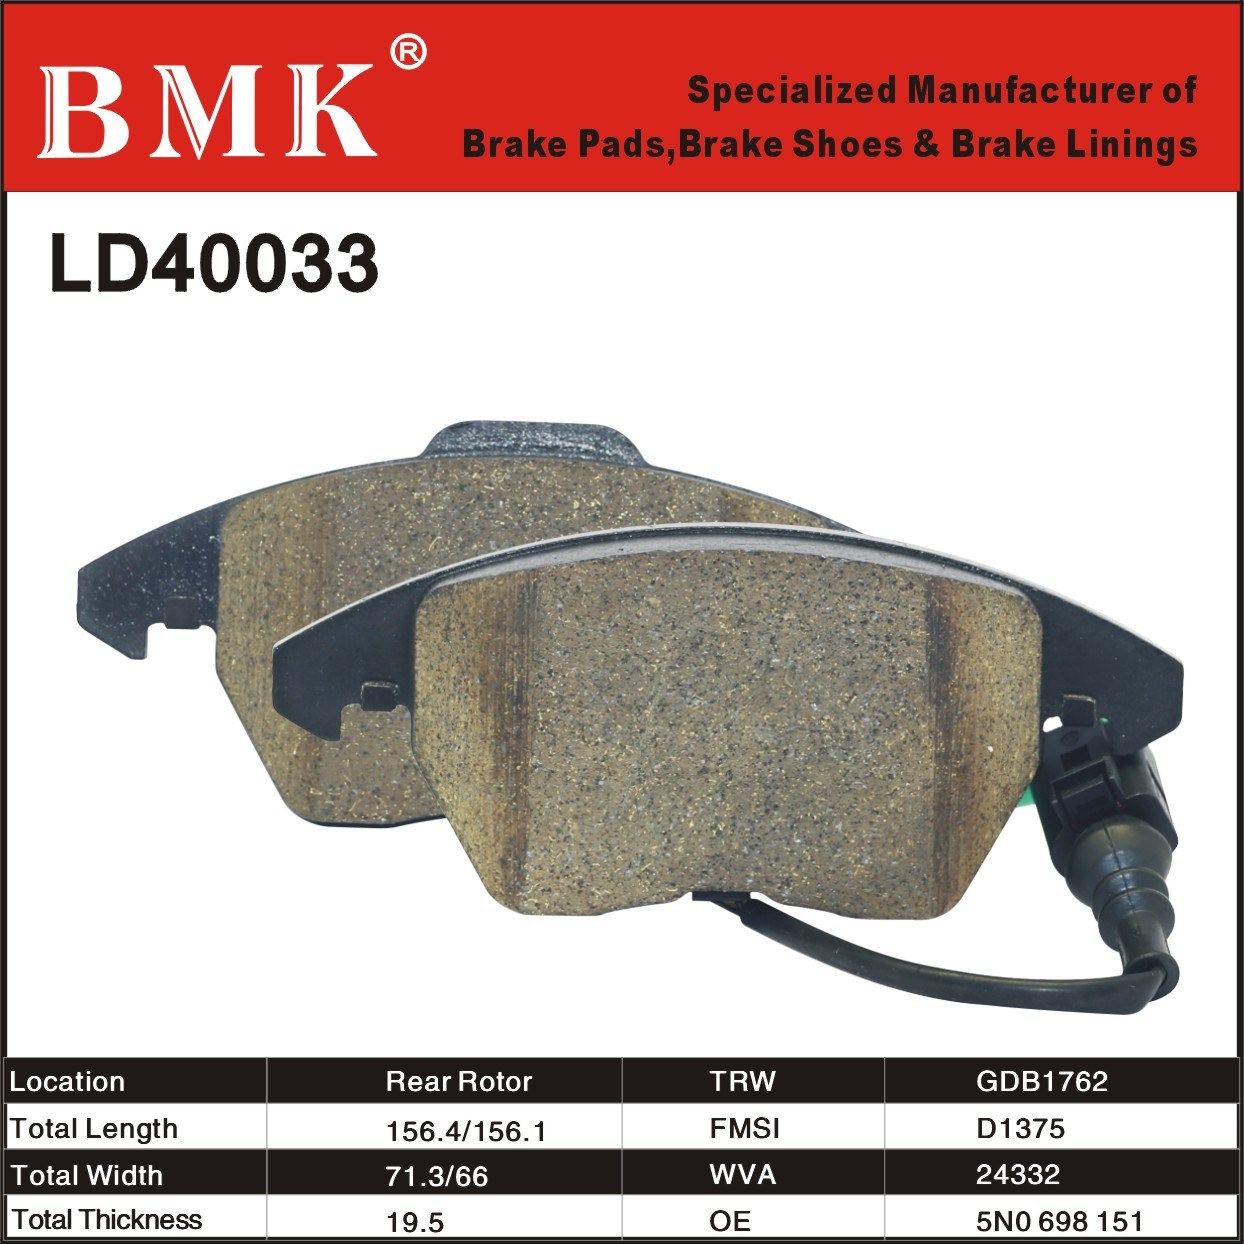 Ceramic Brake Pads (D40033) for Volkswagen